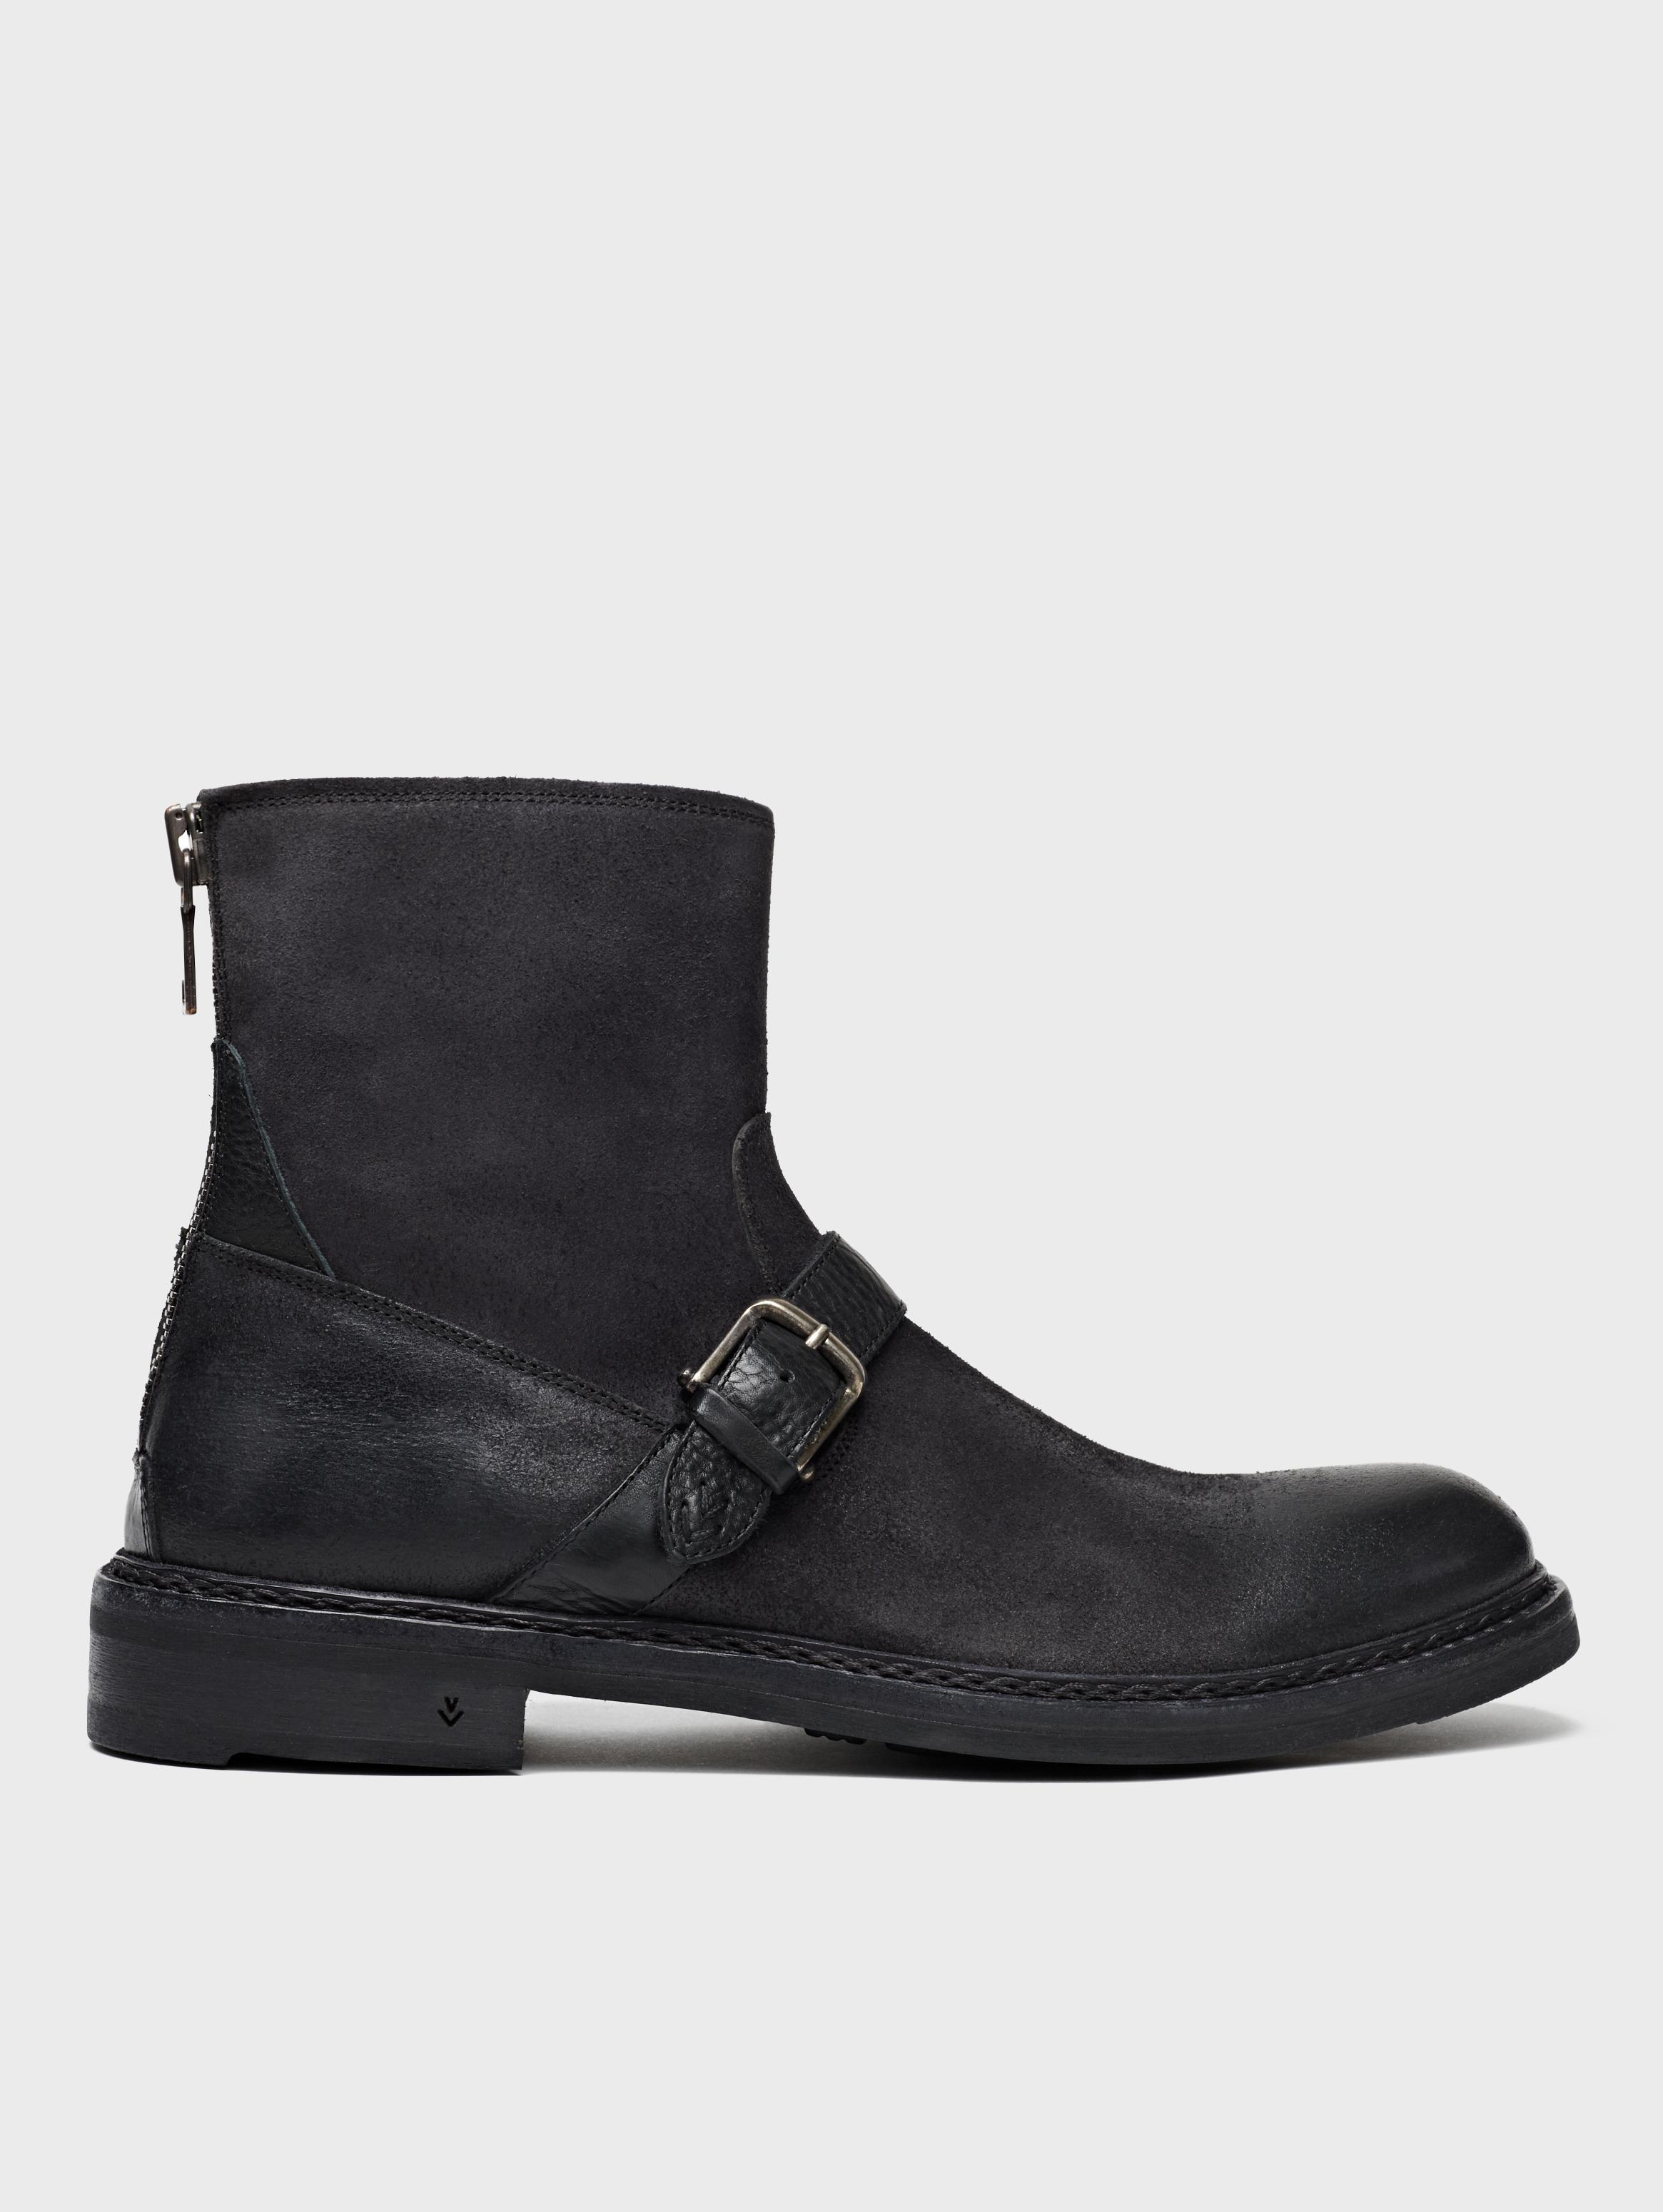 John Varvatos Ellis Moto Boot Black Size: 9 rB5GrJe7